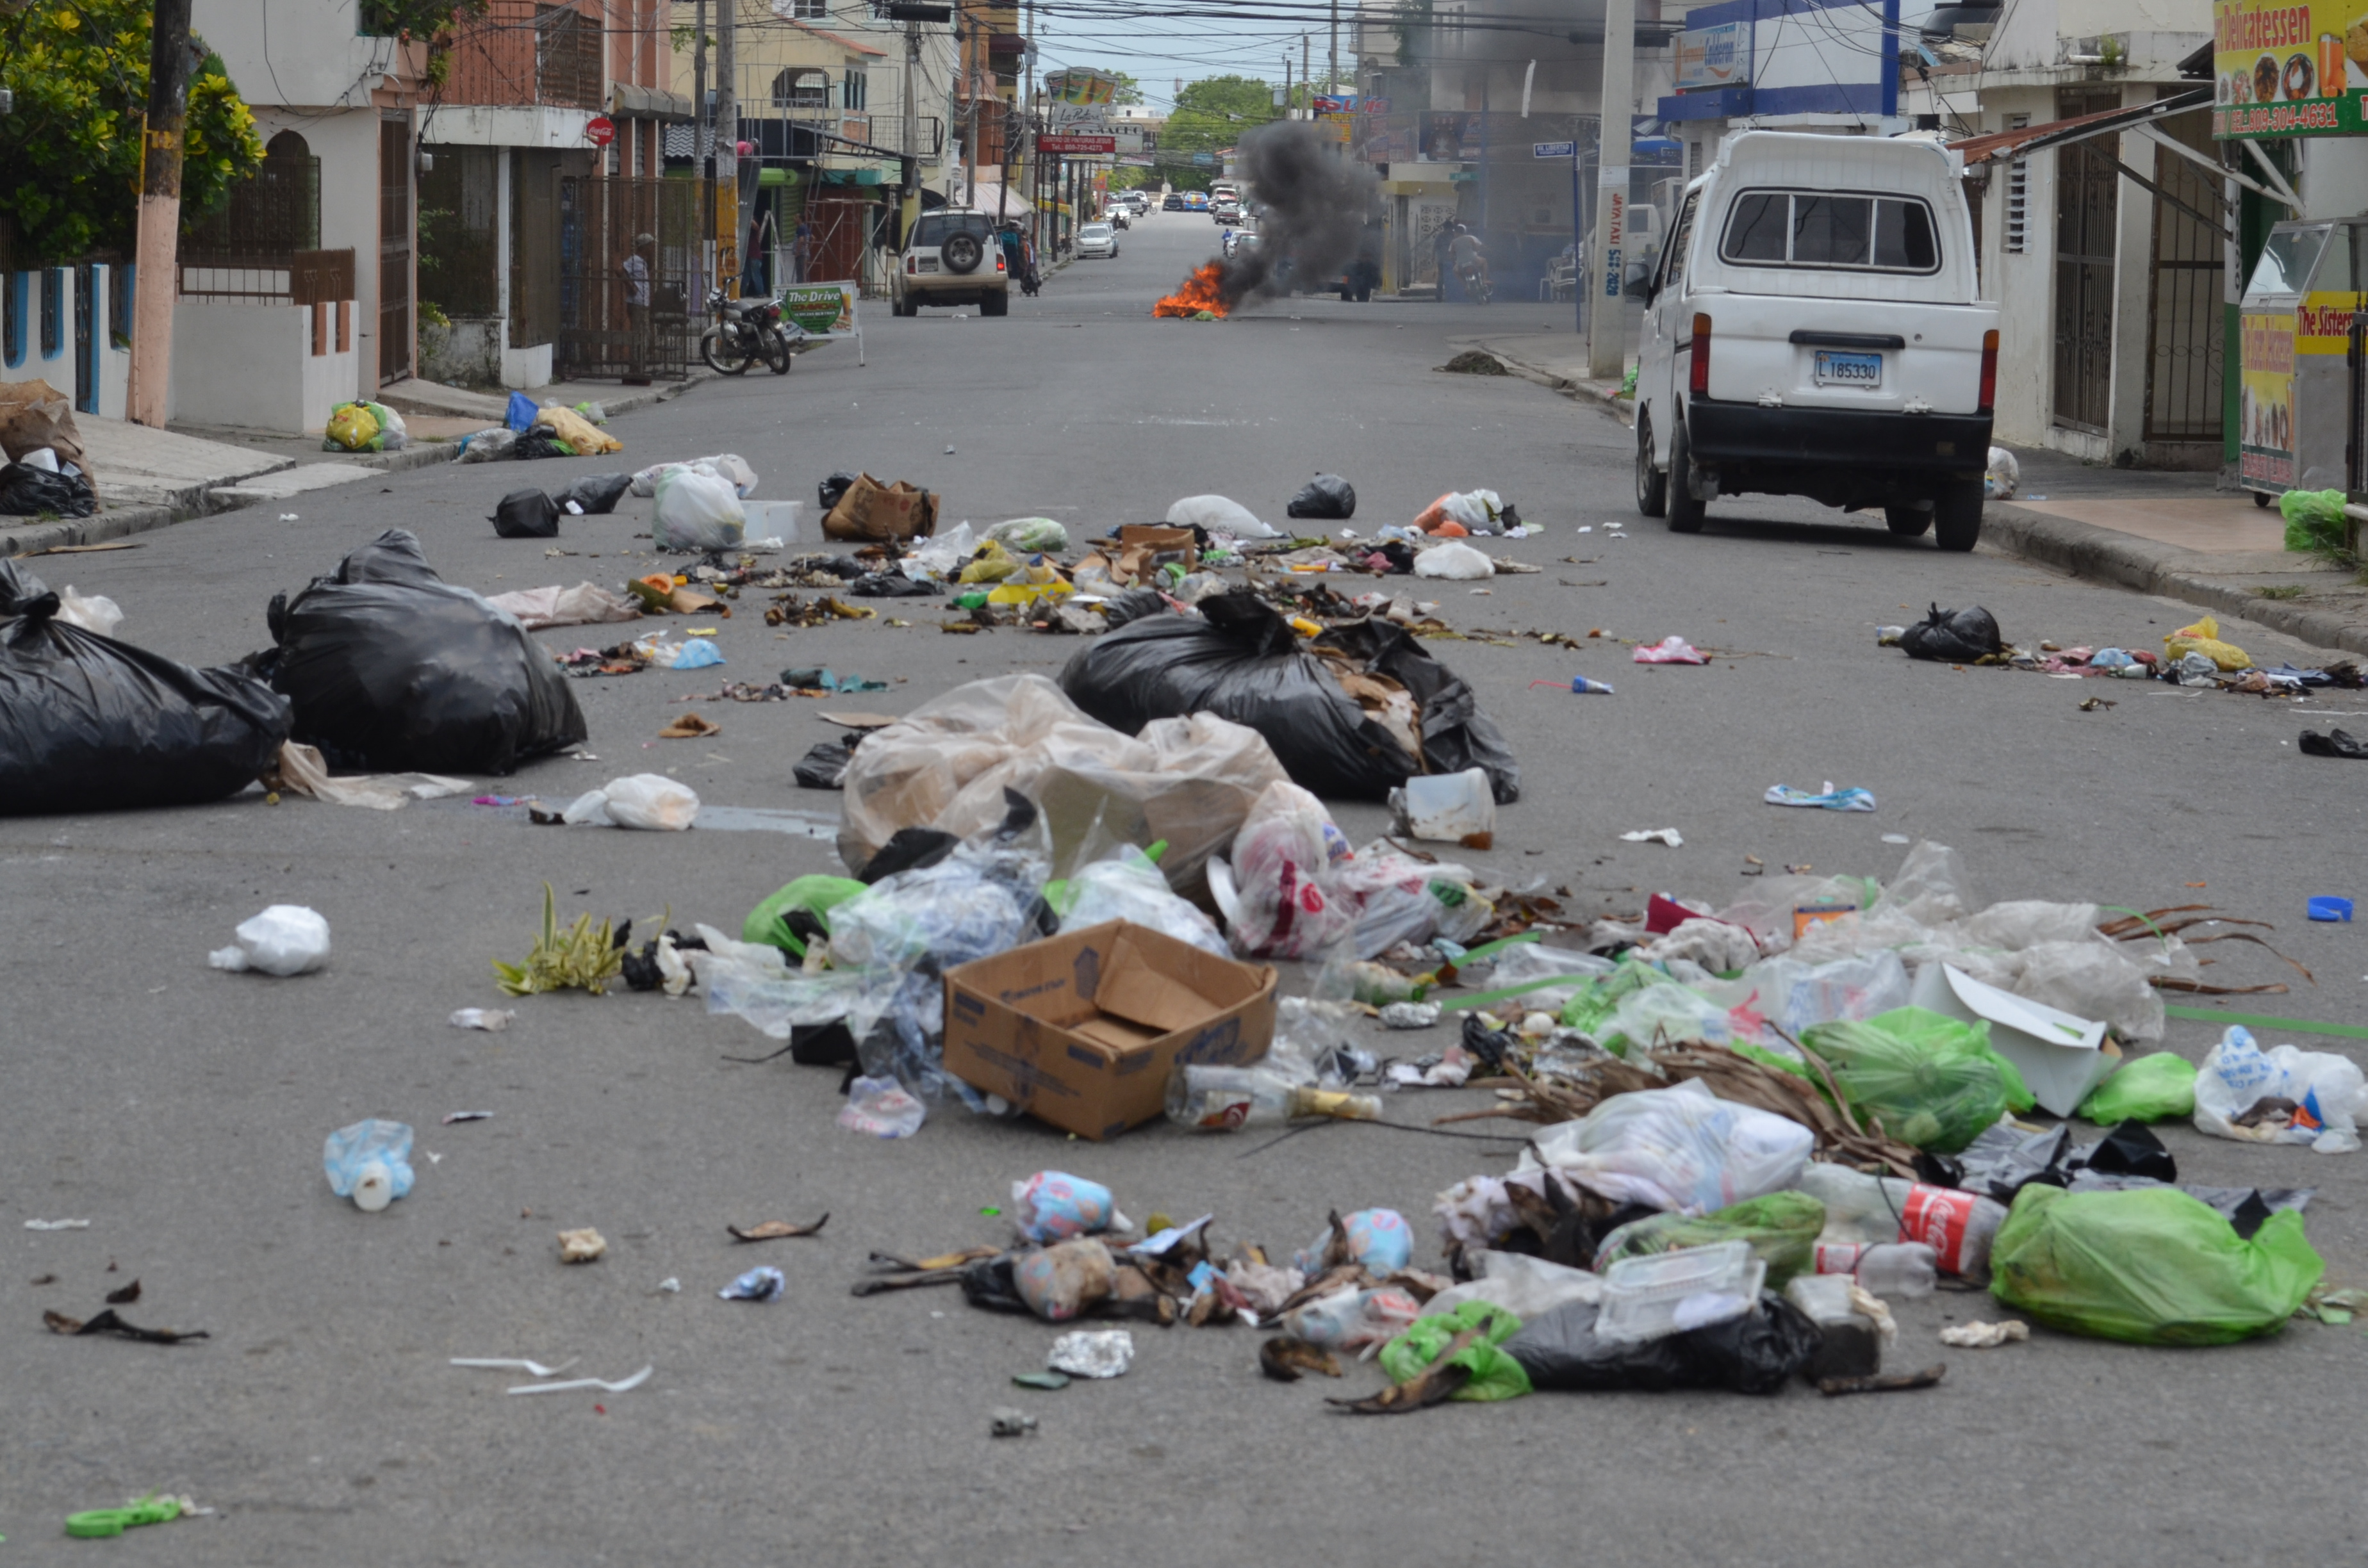 Protestan ante falta de recogida de basura en SFM